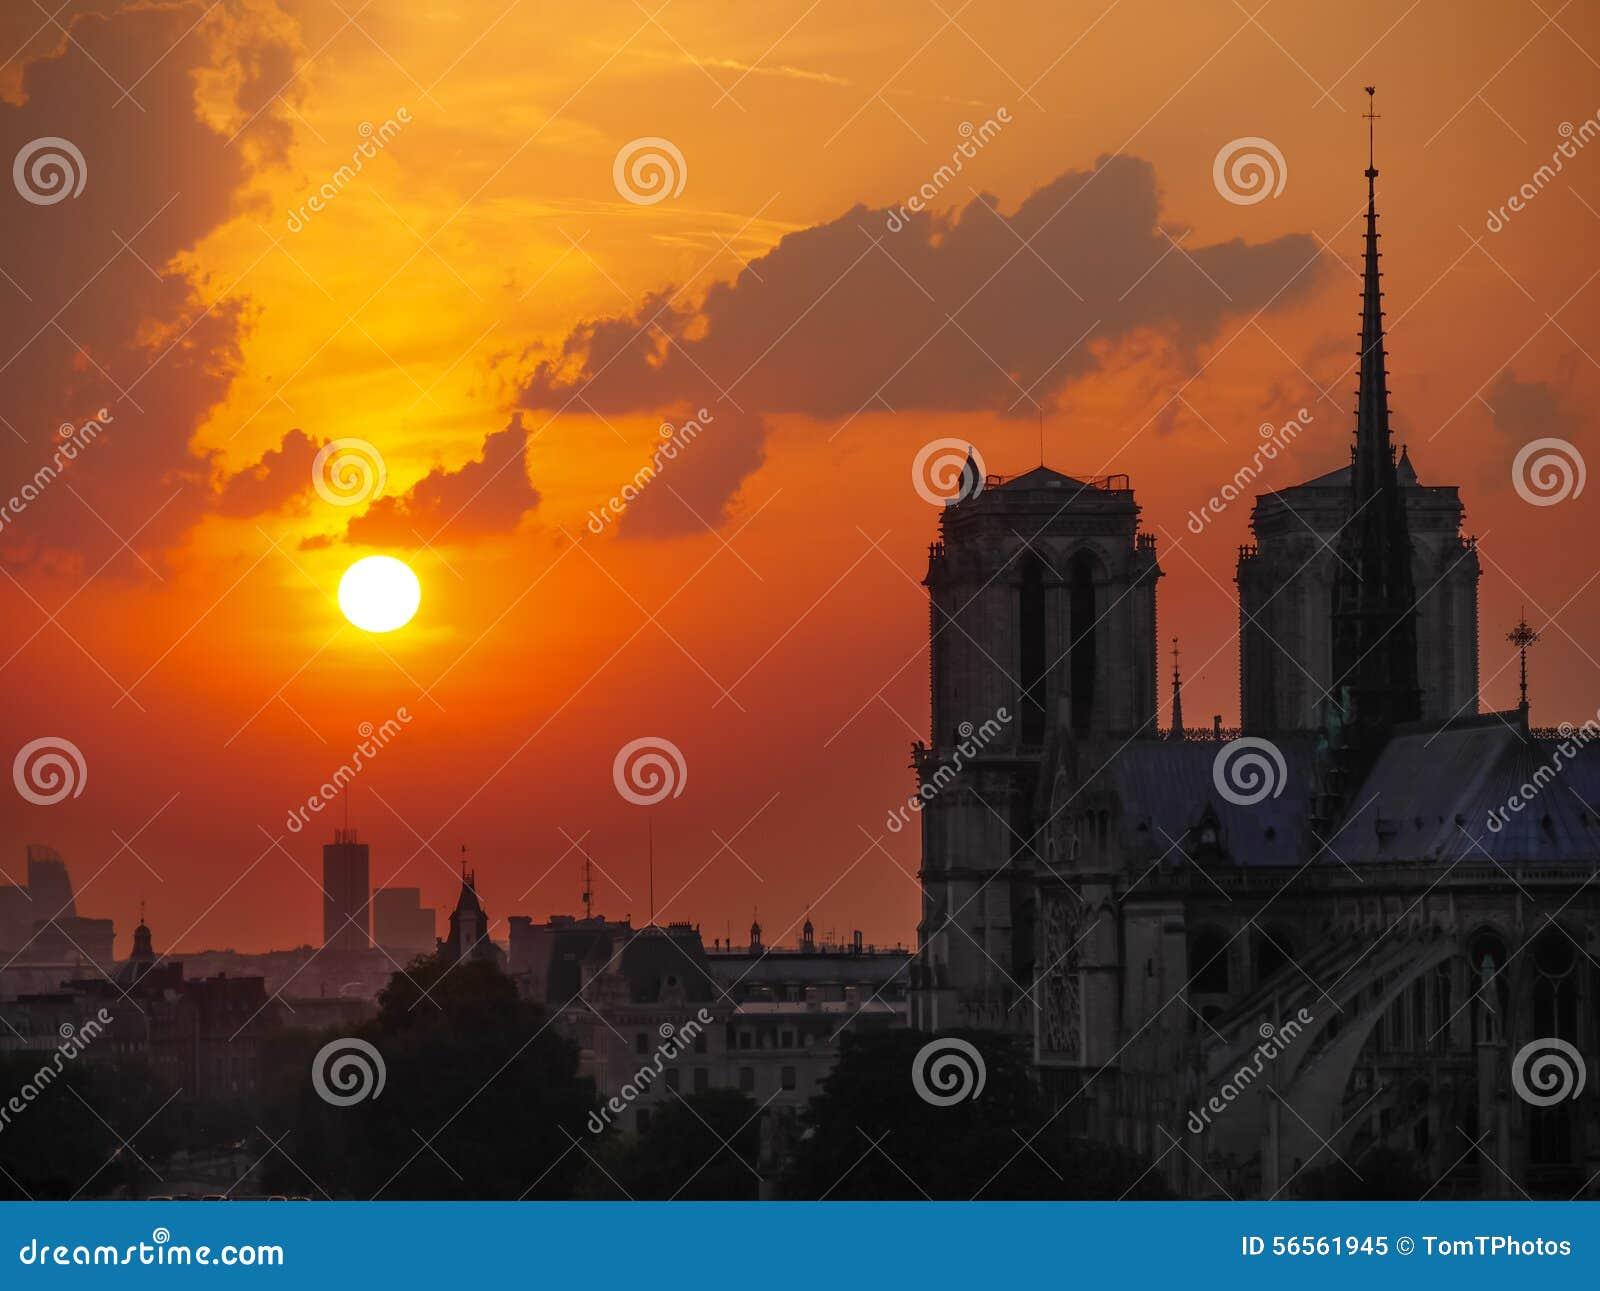 Download Ο καθεδρικός ναός της Notre Dame στο ηλιοβασίλεμα στο Παρίσι Στοκ Εικόνα - εικόνα από παρισινά, κεφάλαιο: 56561945